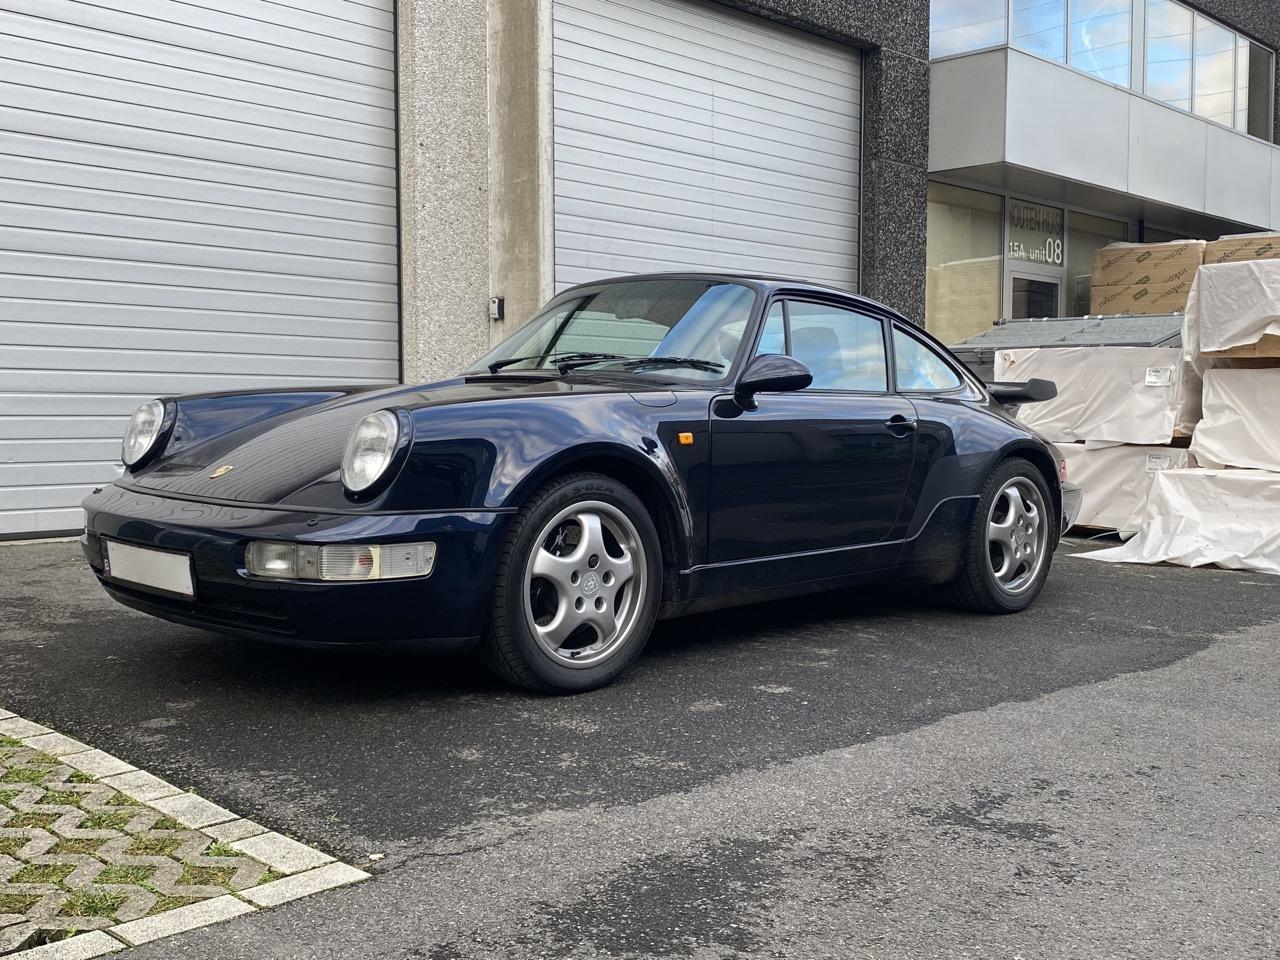 youngtimer.one - Porsche 964 turbo - Nachtblau - 1991 - 1 of 3